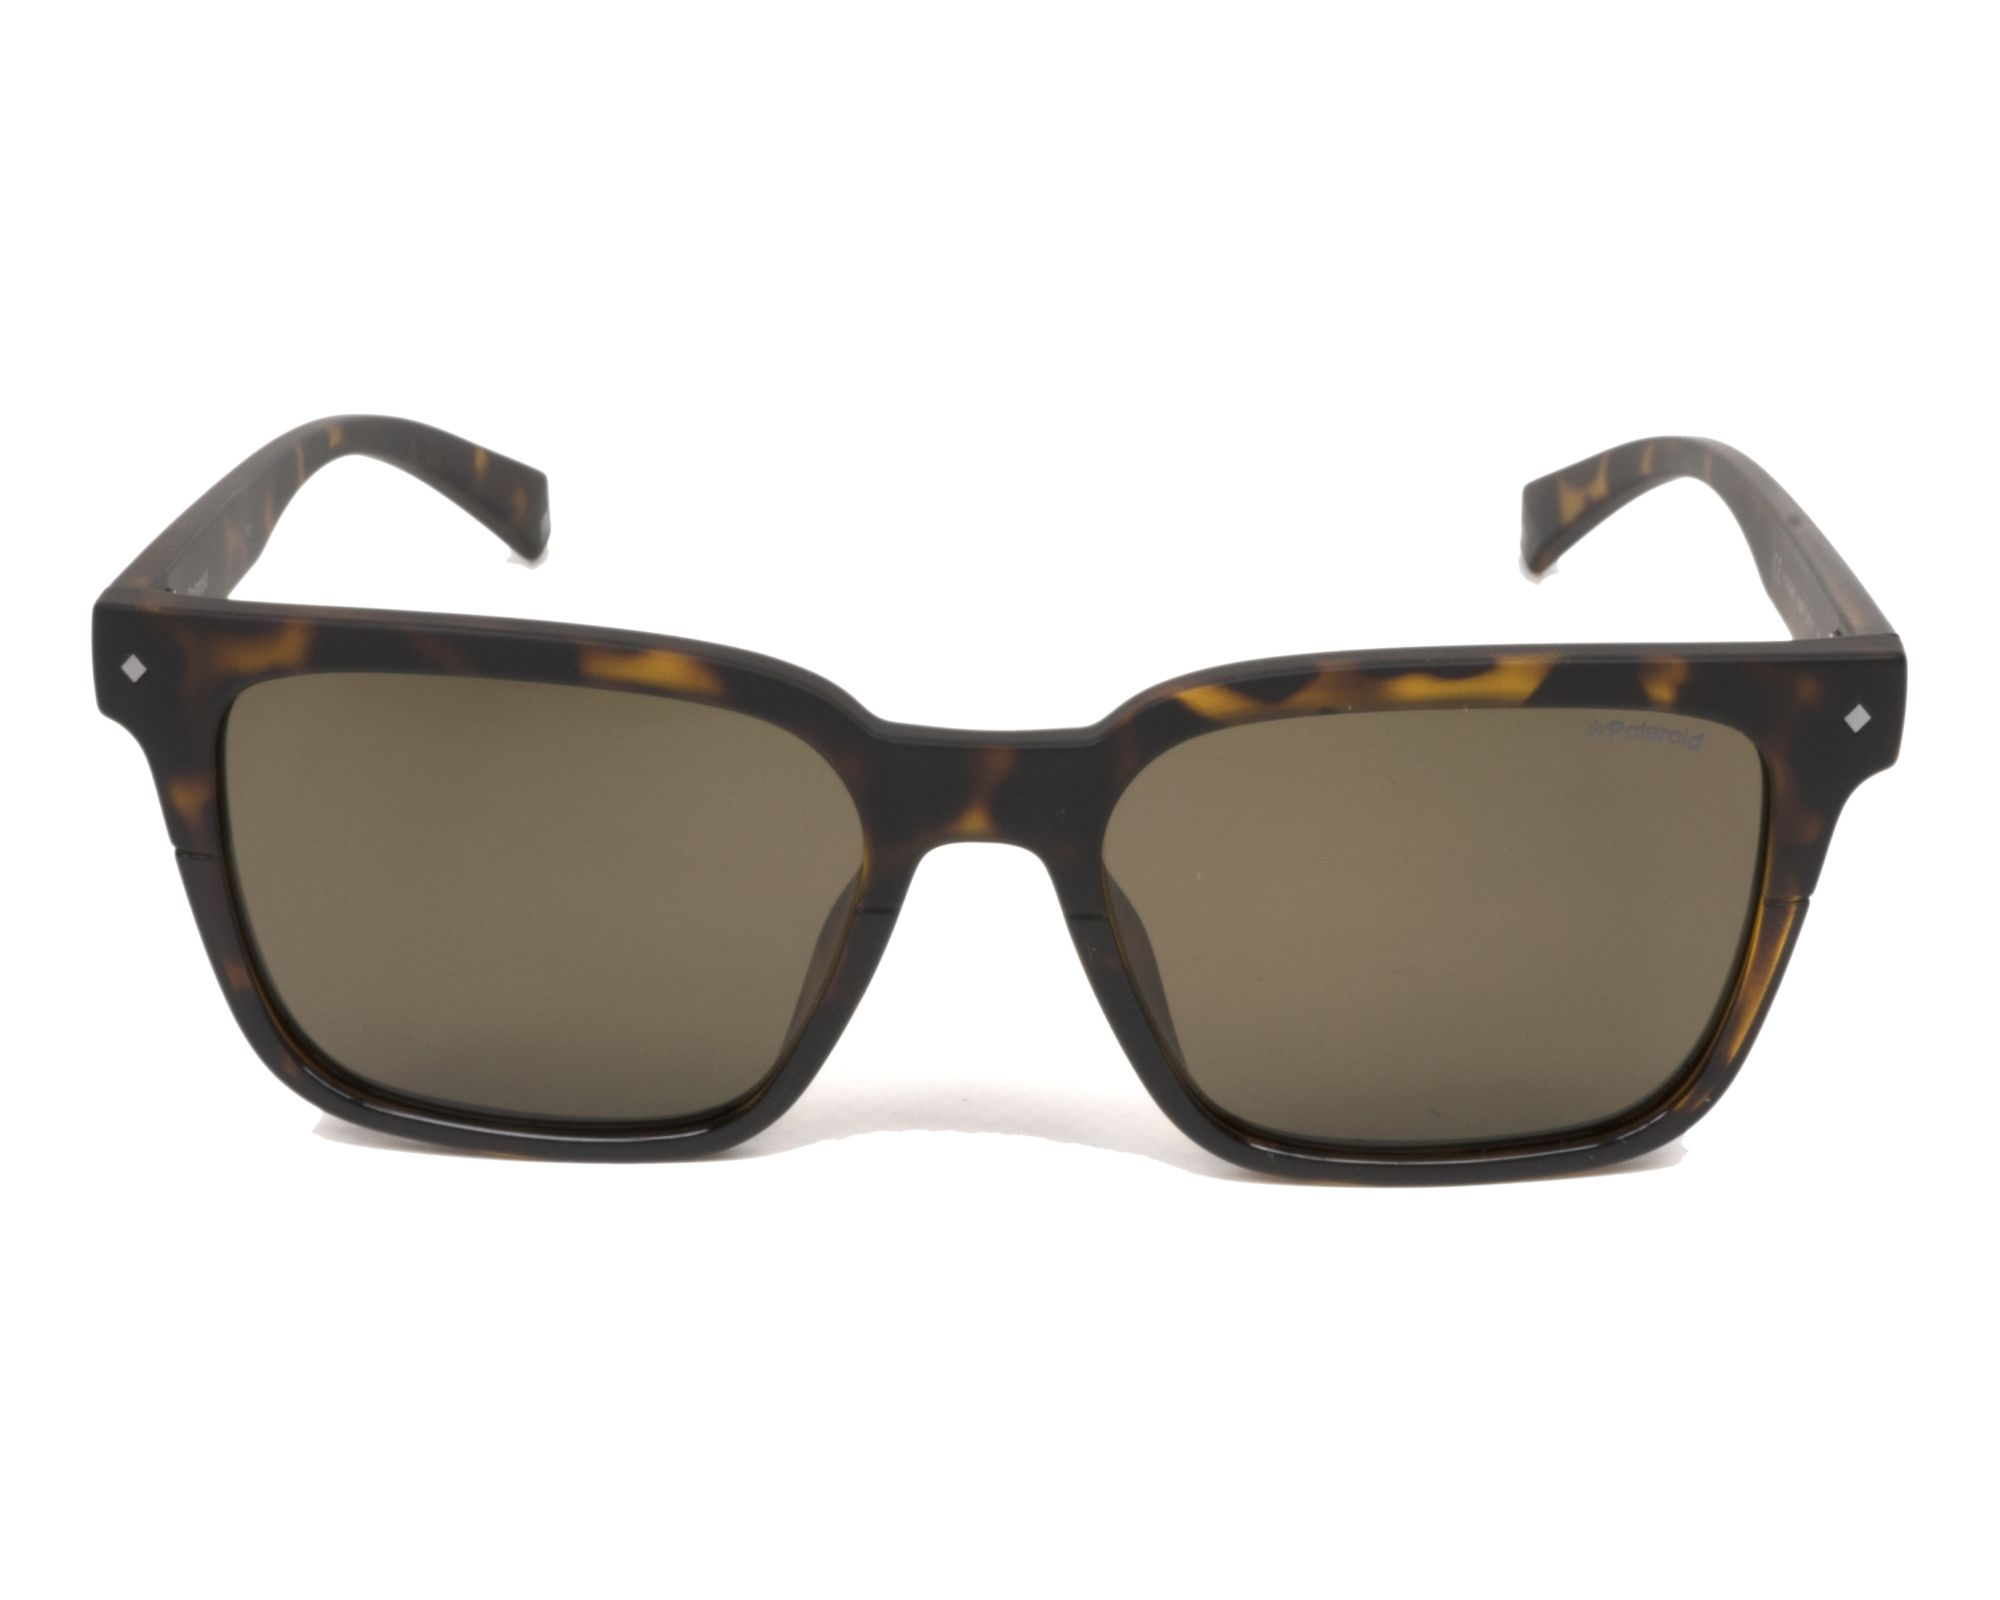 c3a0c0ee3b1 Sunglasses Polaroid PLD-6044-S 086 SP 52-17 Havana Havana front